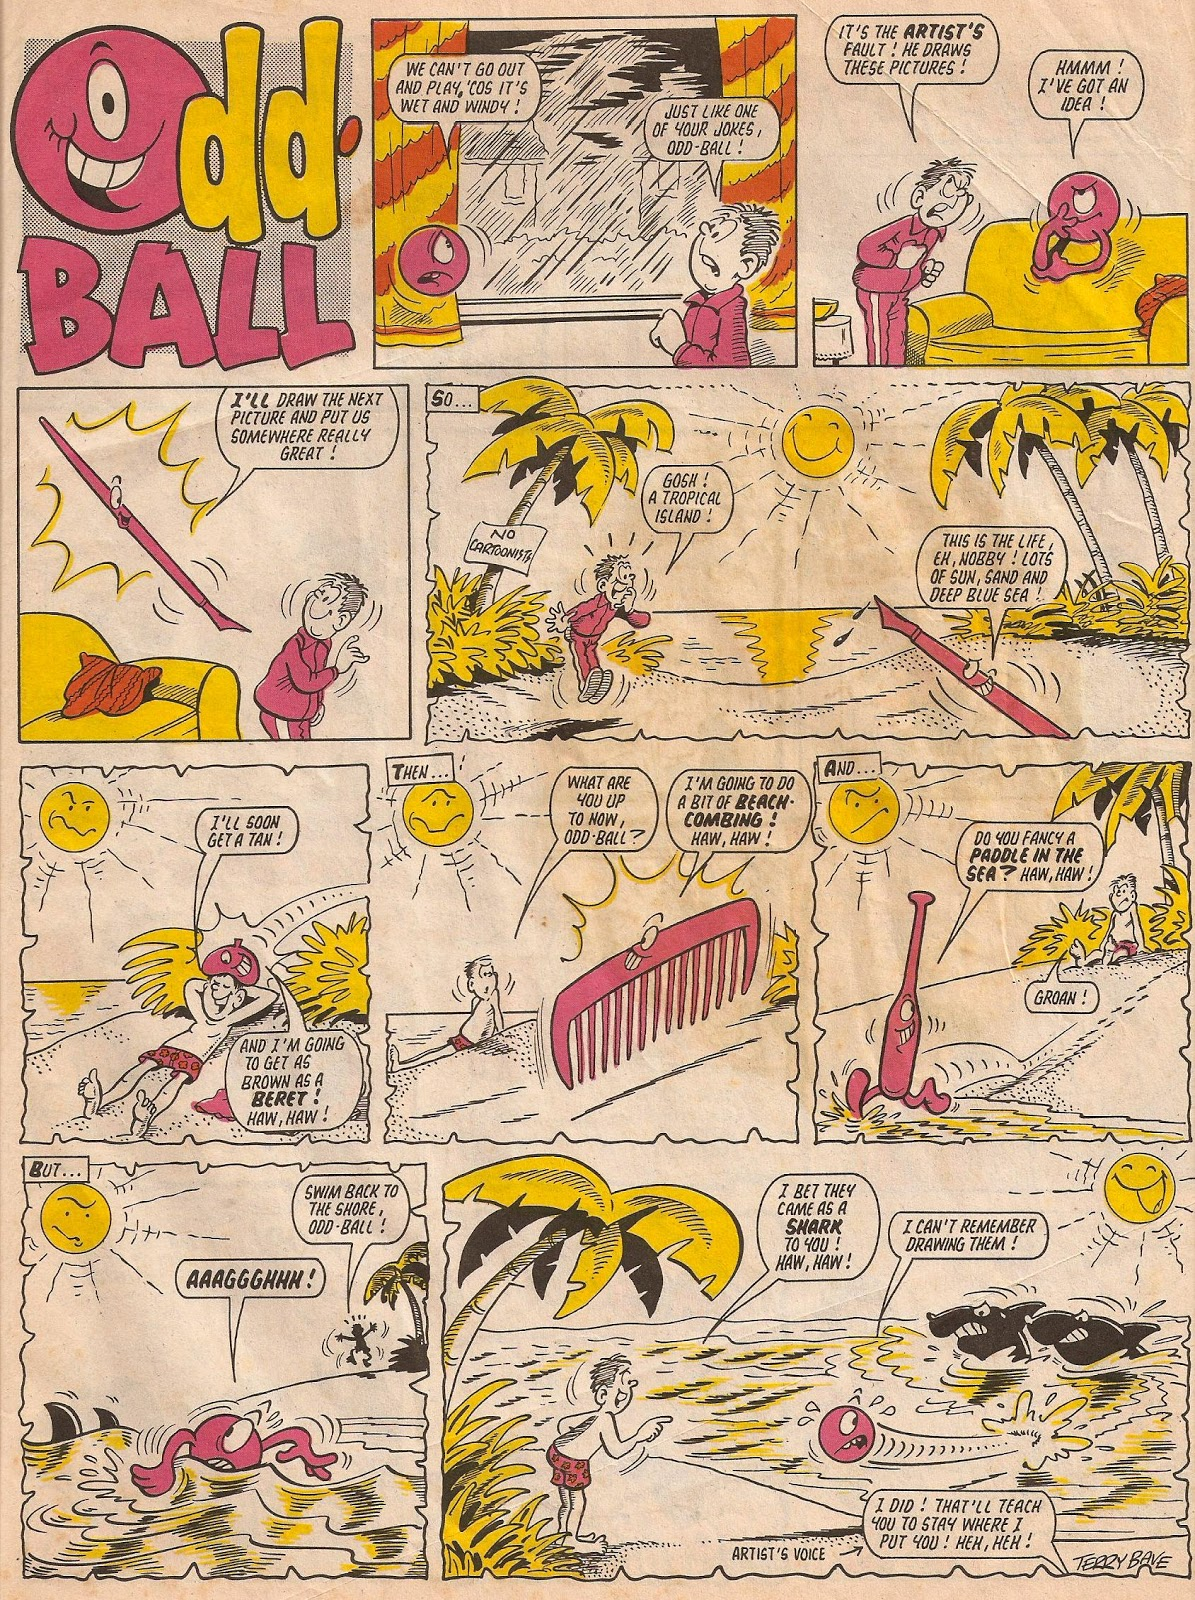 Odd Ball (comic strip)